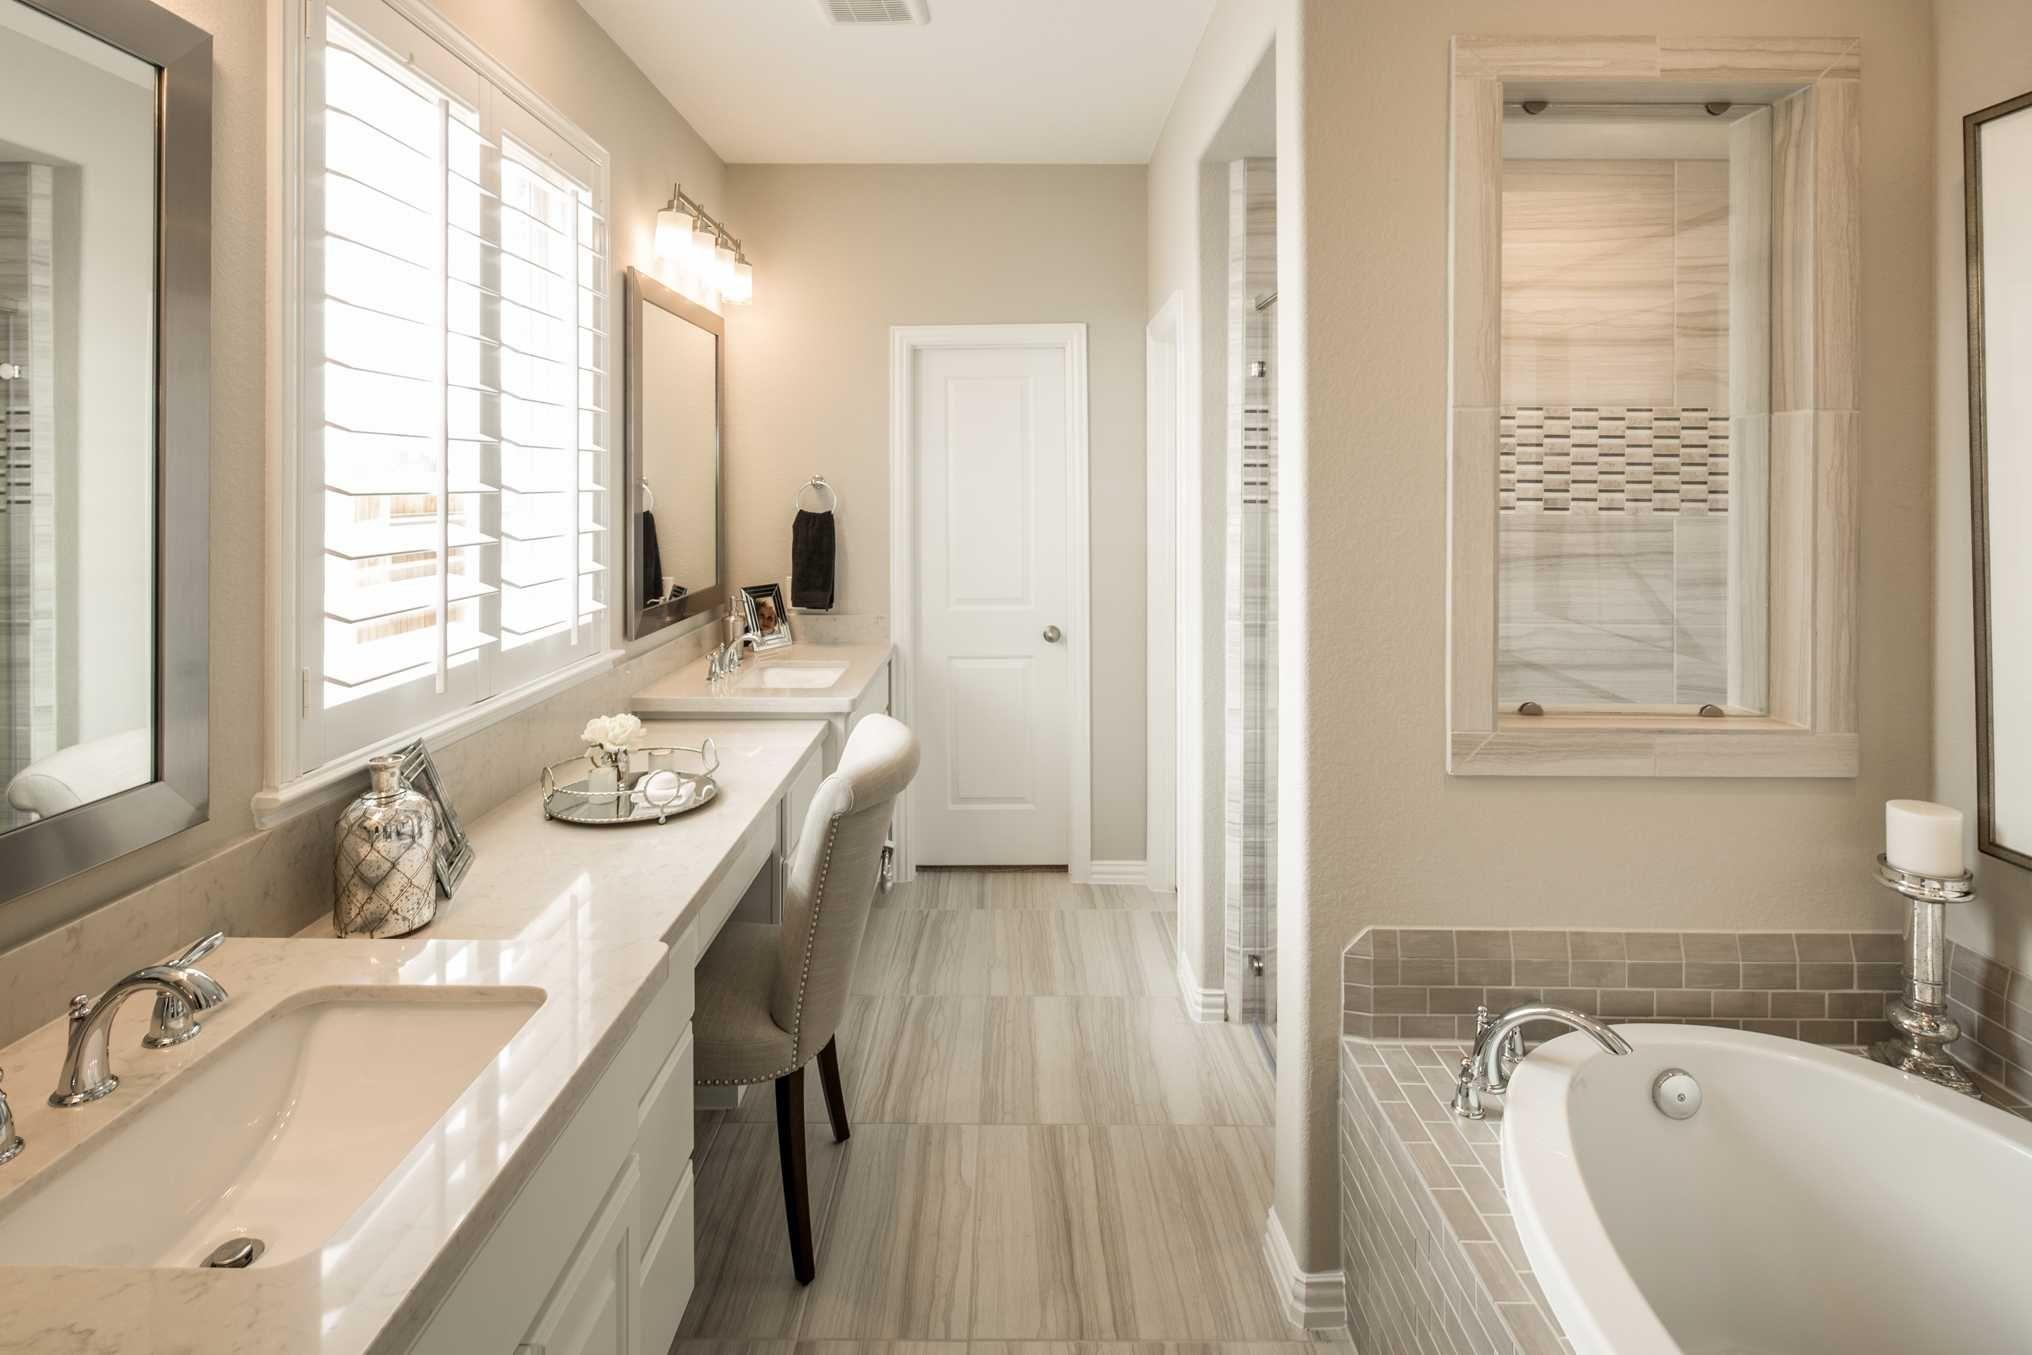 Highland Homes Plan 559h Model Home In Houston Texas Cross Creek Ranch Community Bathroomdesign Model Homes Home Home Builders